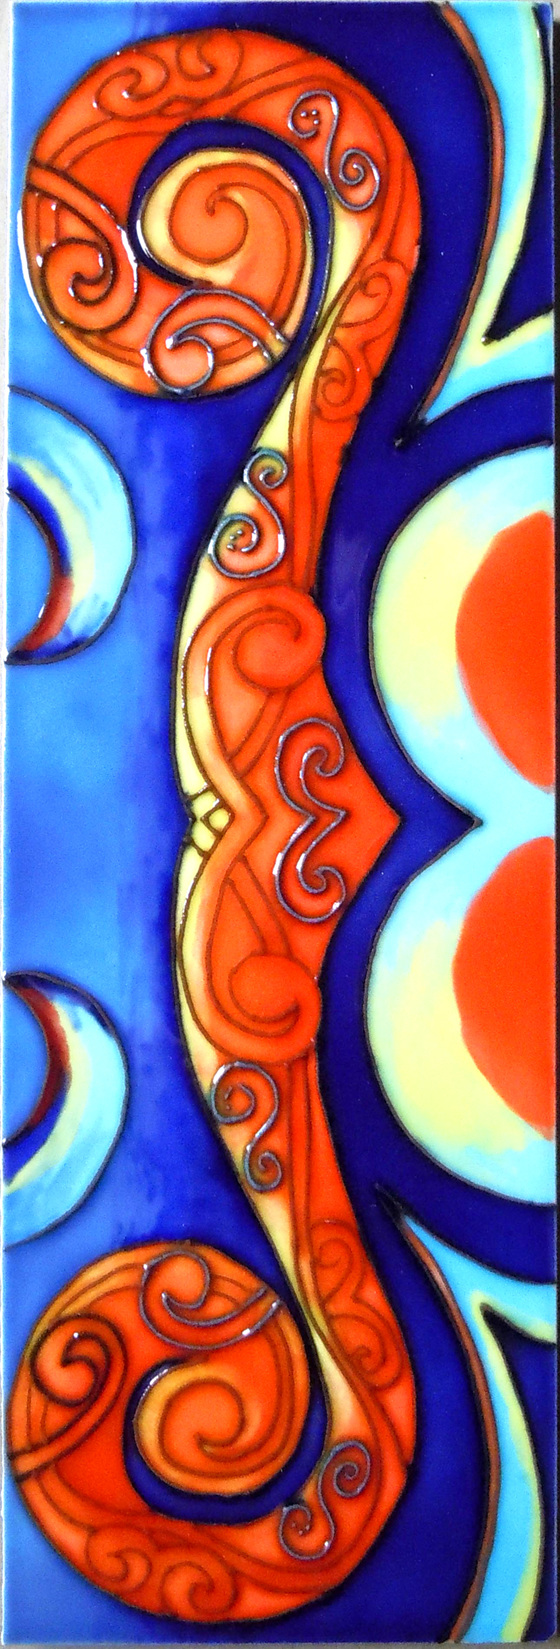 Ceramic Wall Art Reina orange CT86